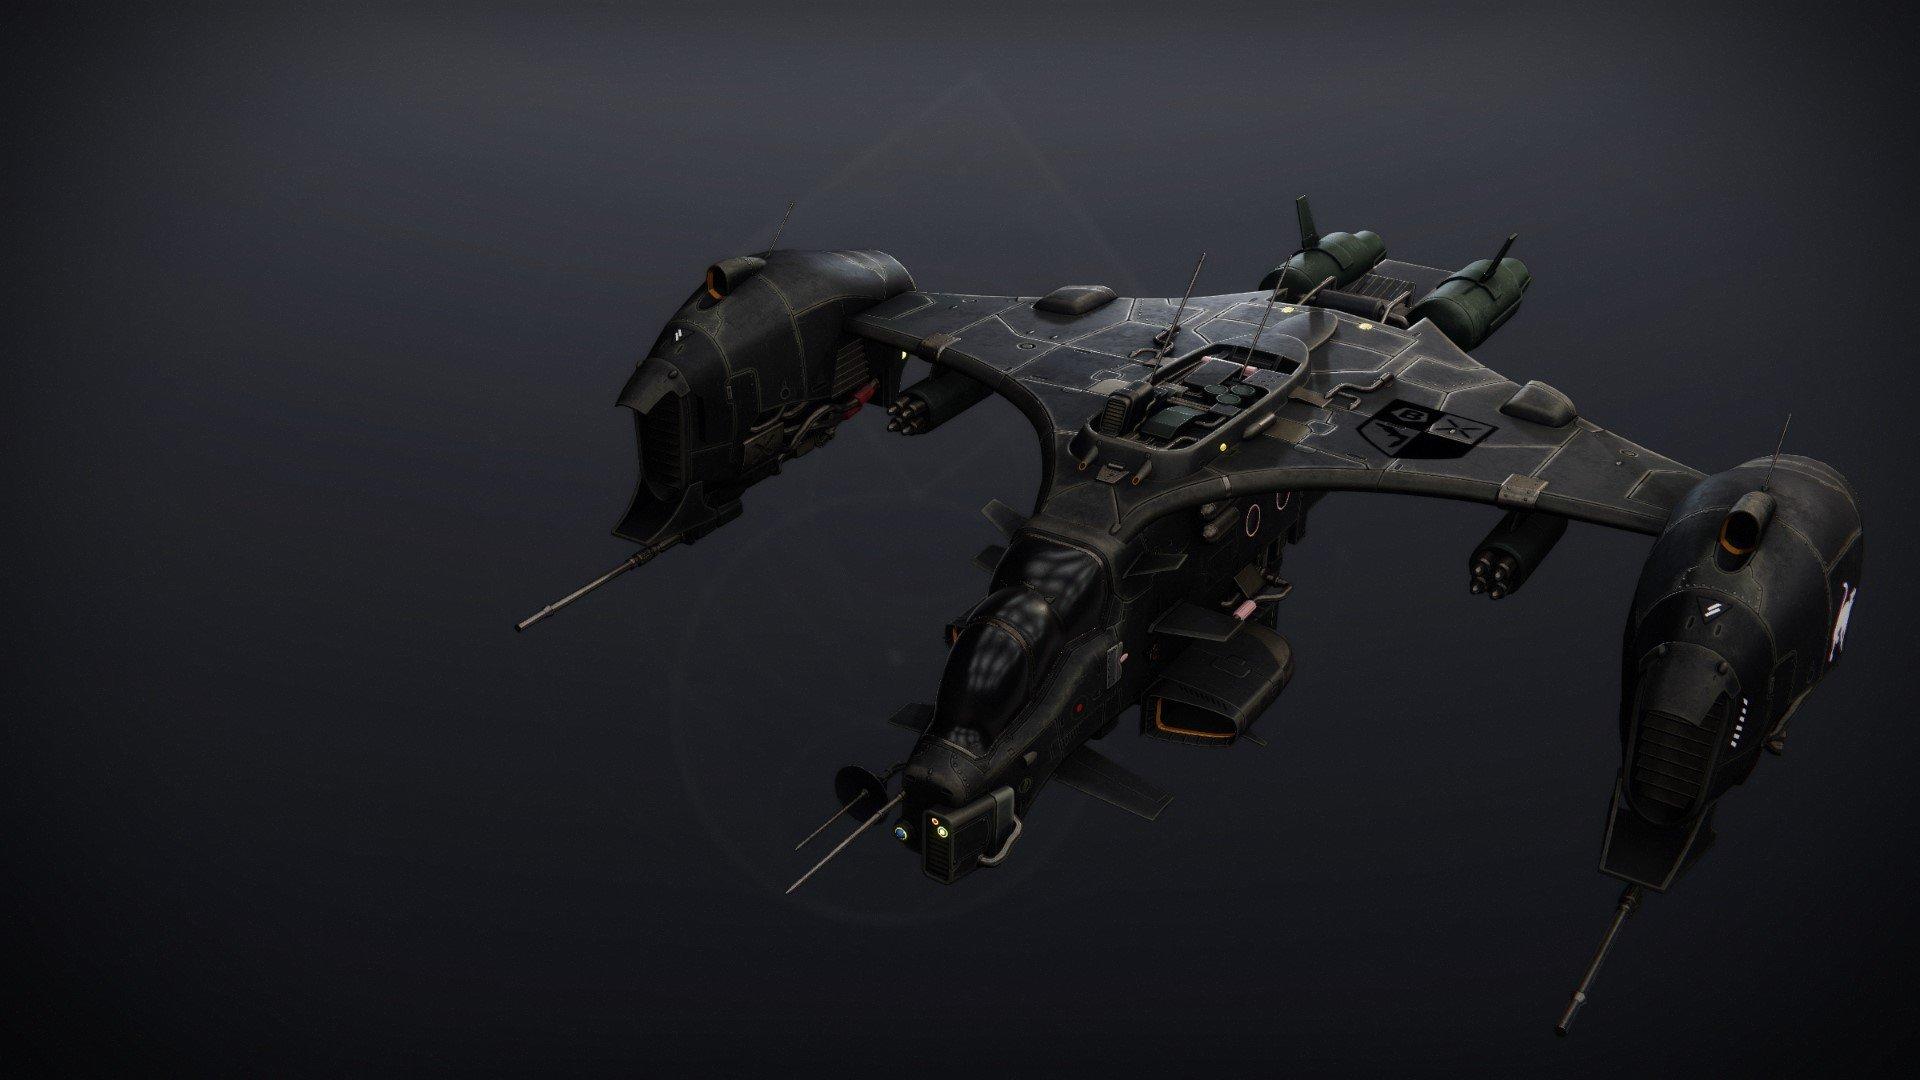 An in-game render of the Pragmat Harrier.